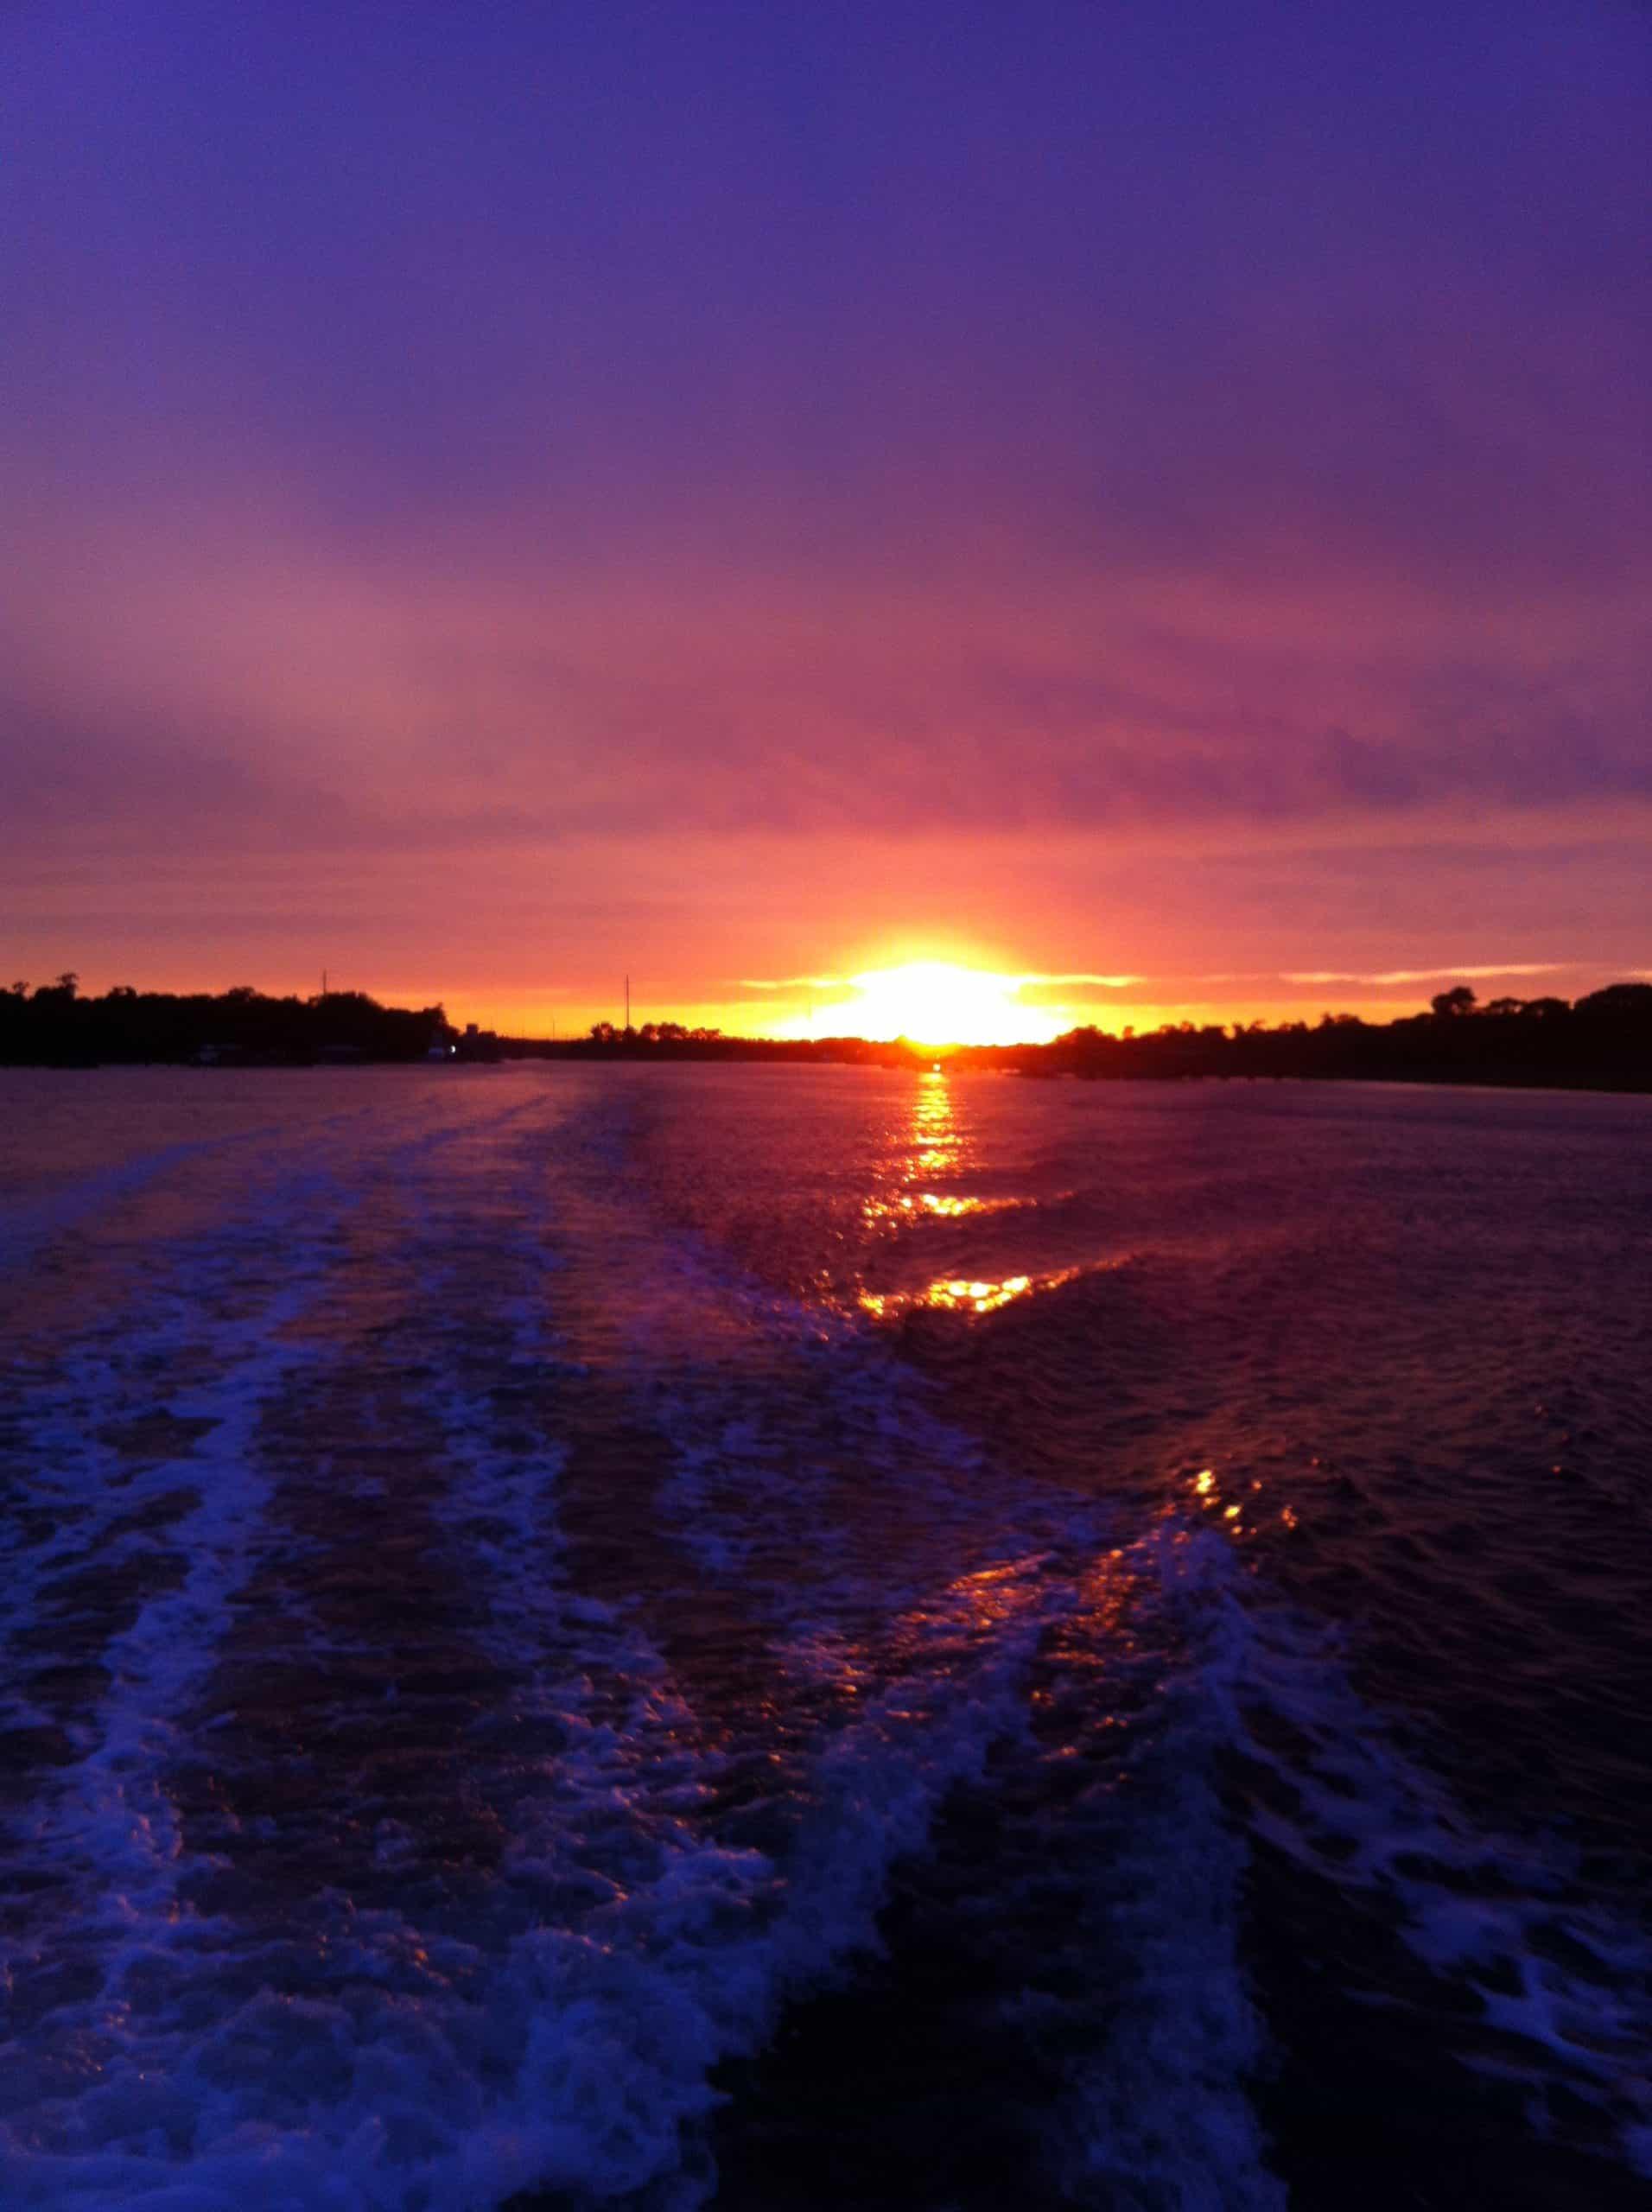 Purple sunset setting over purple water. Sunset cruise Charleston, SC